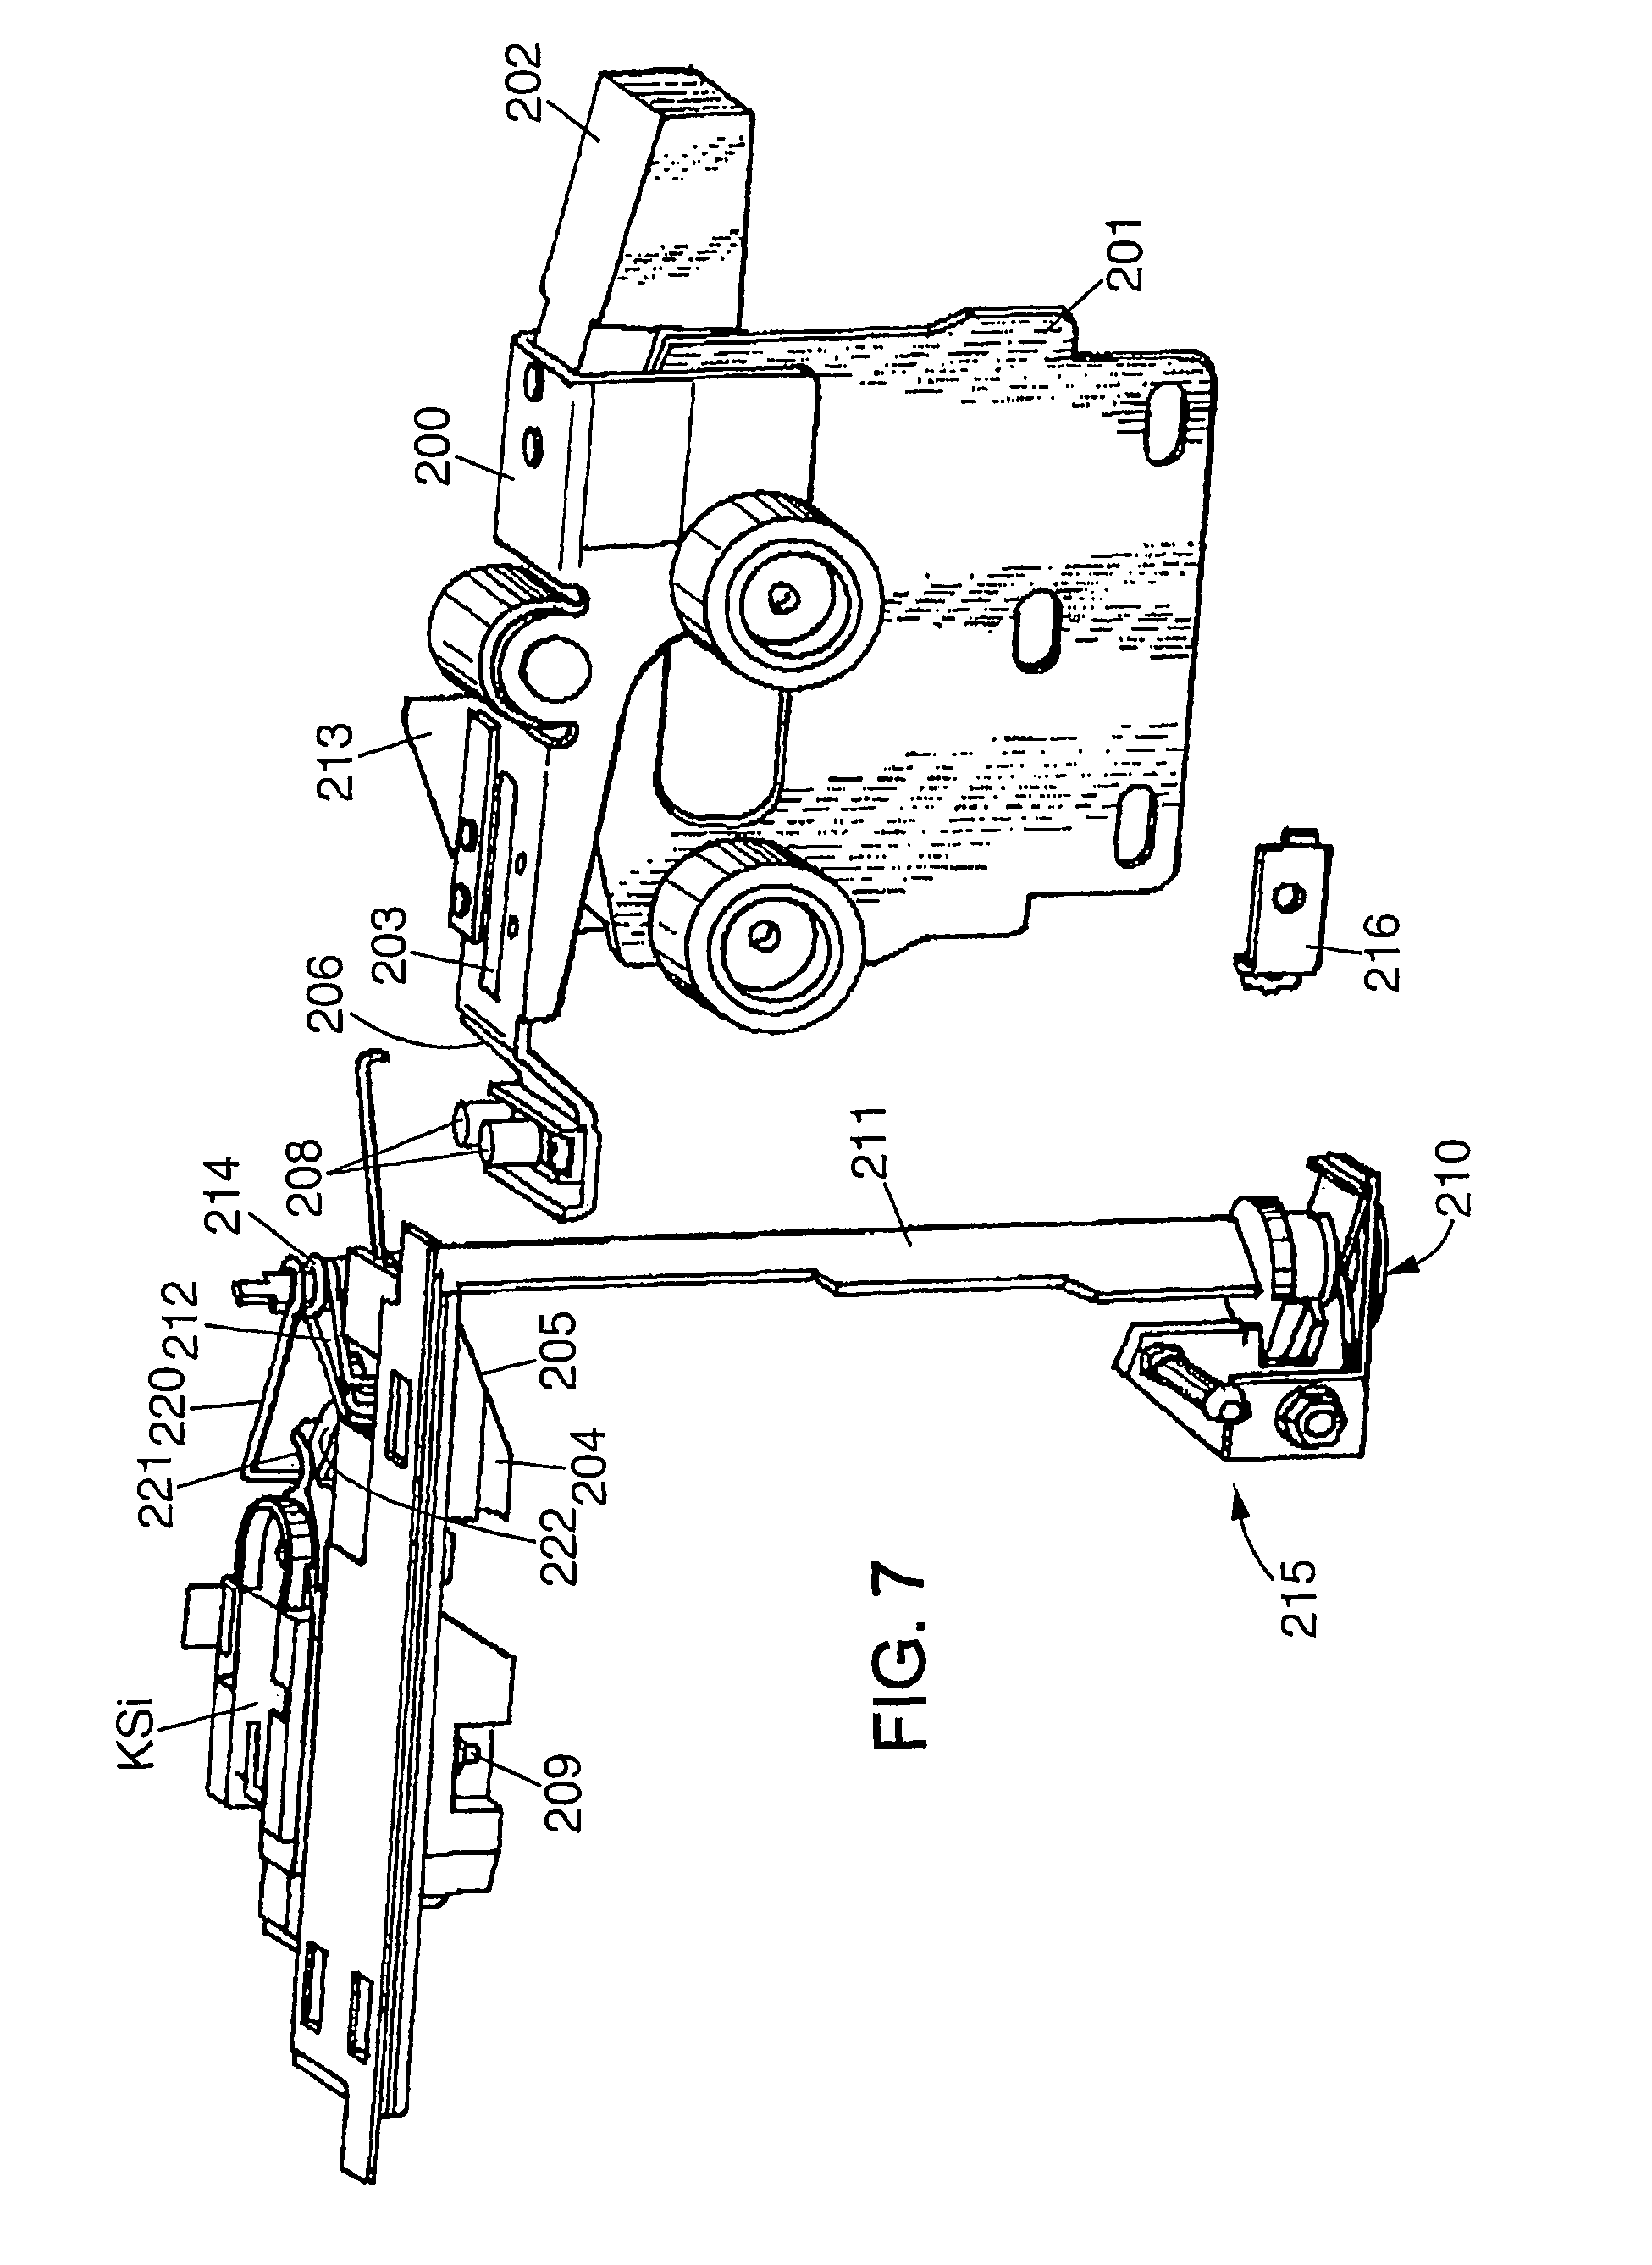 Vrf Wiring Diagram